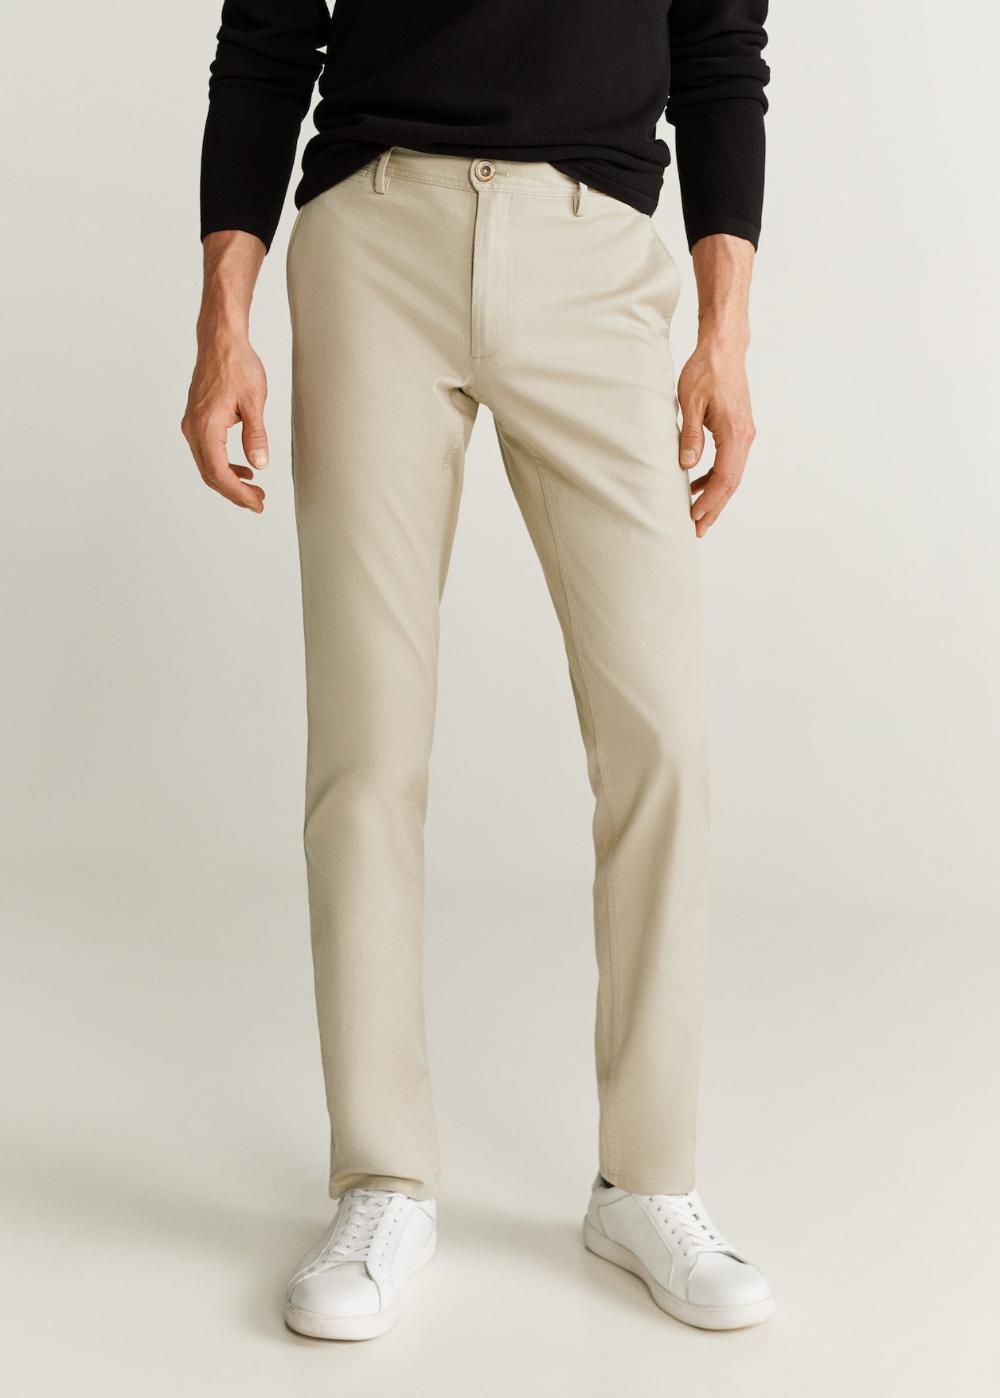 Pantalon Chino Slim Fit Hombre Mango Man Espana Zalando